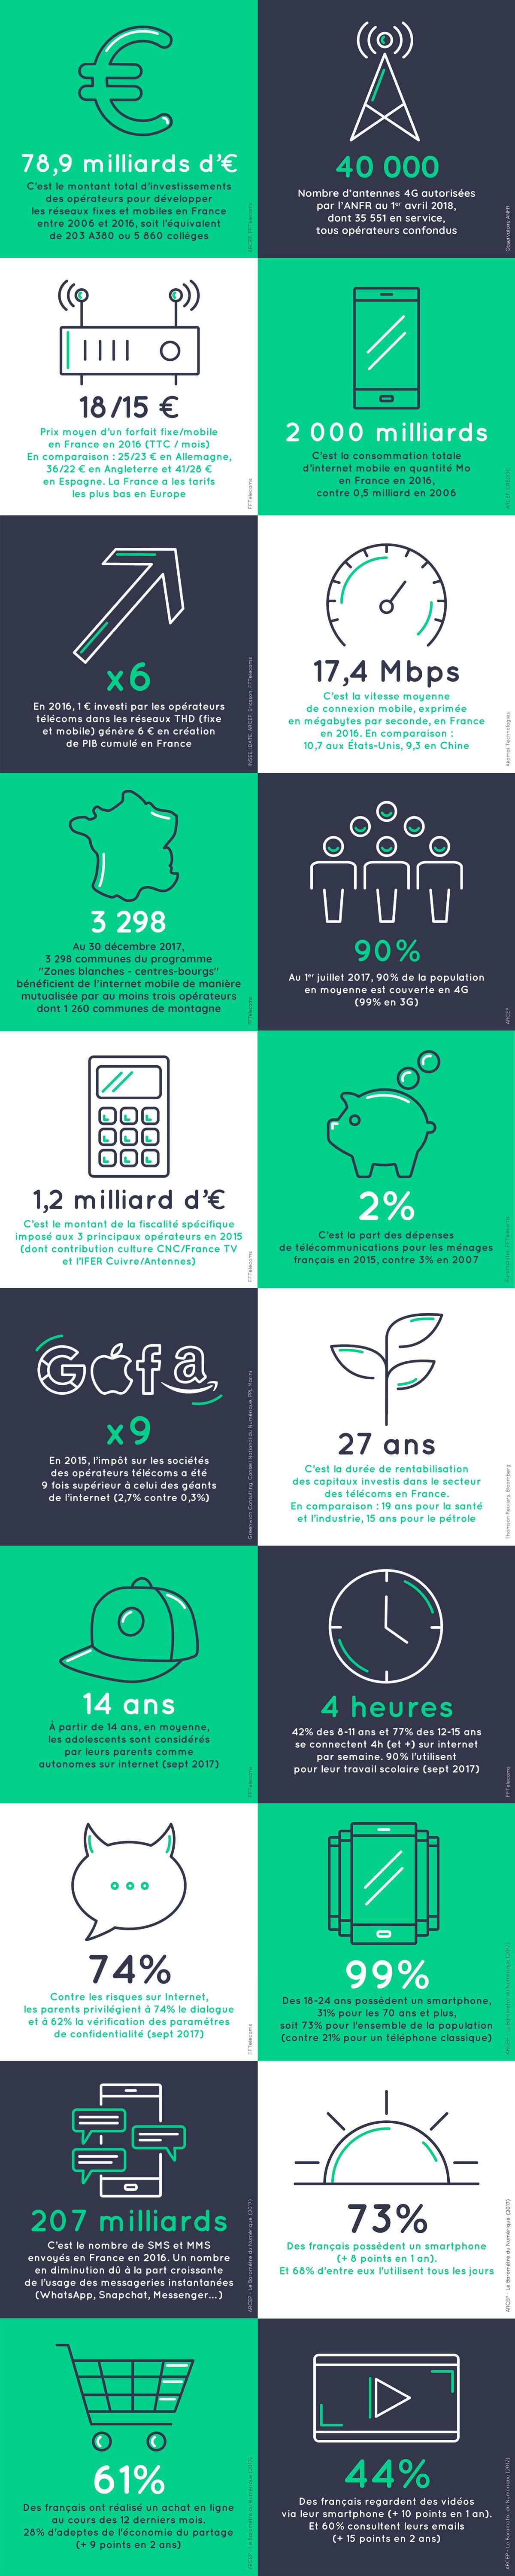 2018_04_11_chiffres_cles_fr